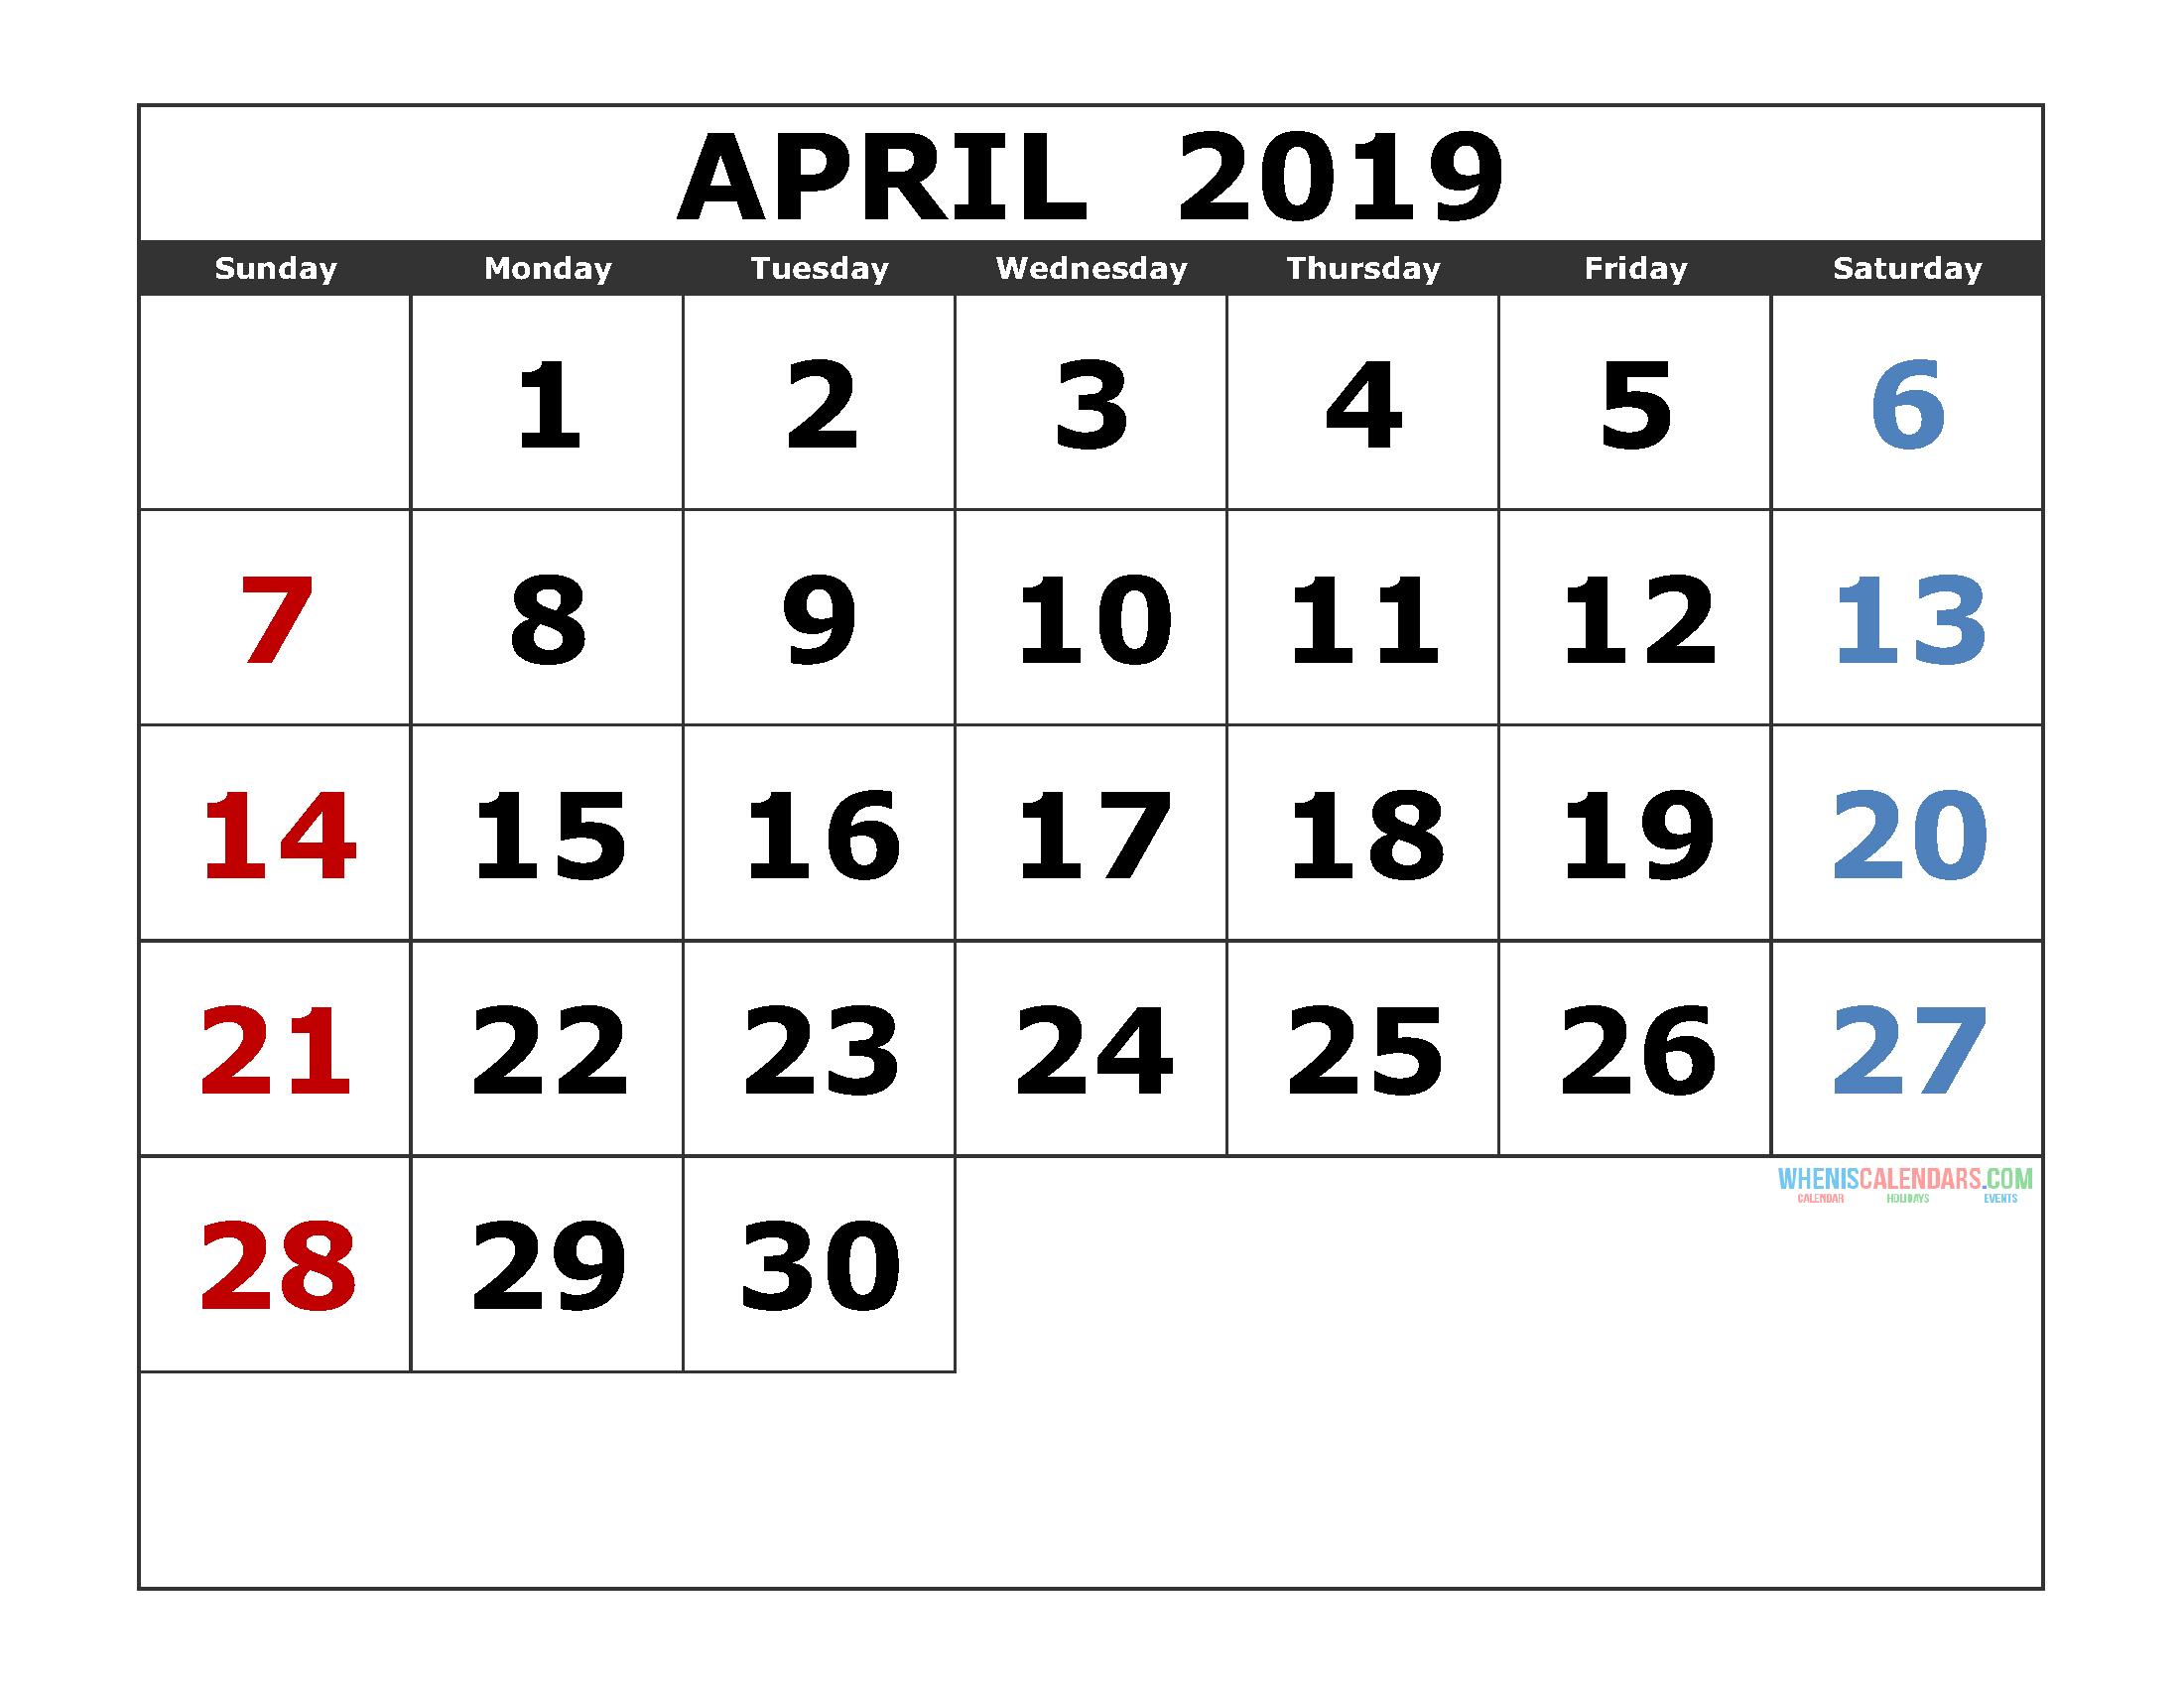 Free Calendar Printable Blank.Free Monthly Blank April 2019 Calendar Printable Template